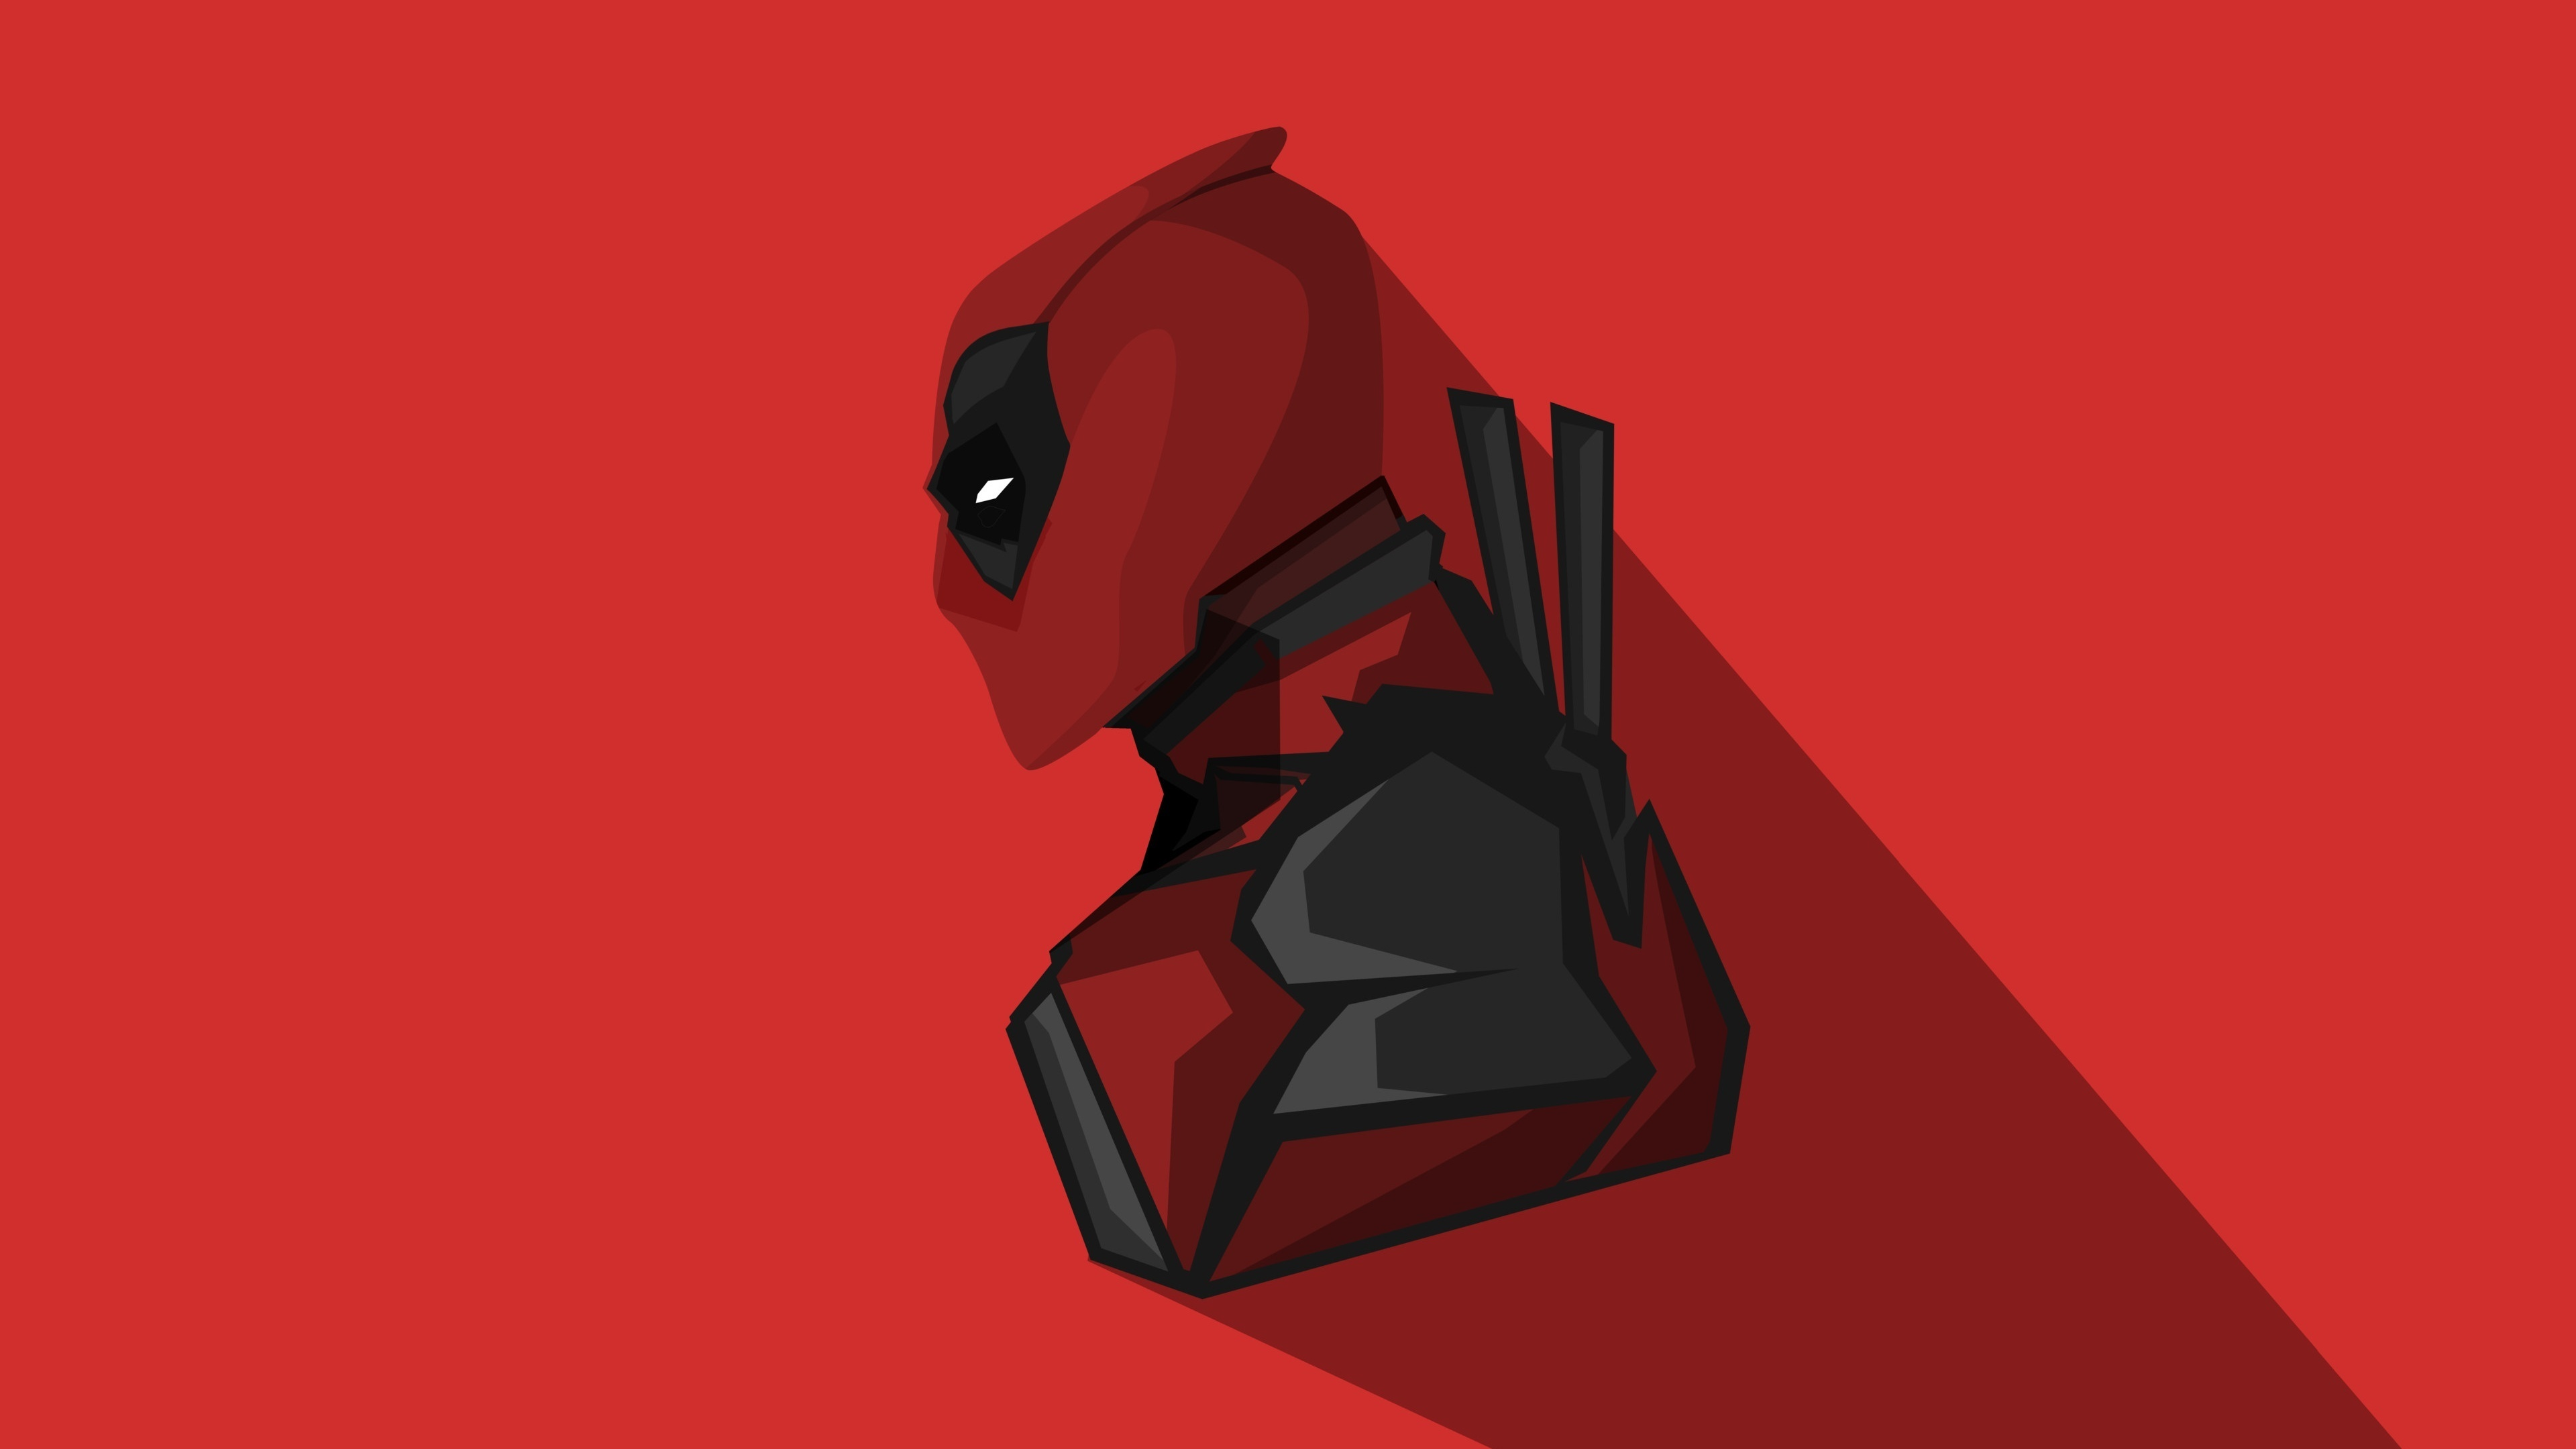 Download 3840x2400 Wallpaper Deadpool Marvel Comics Minimal 4k